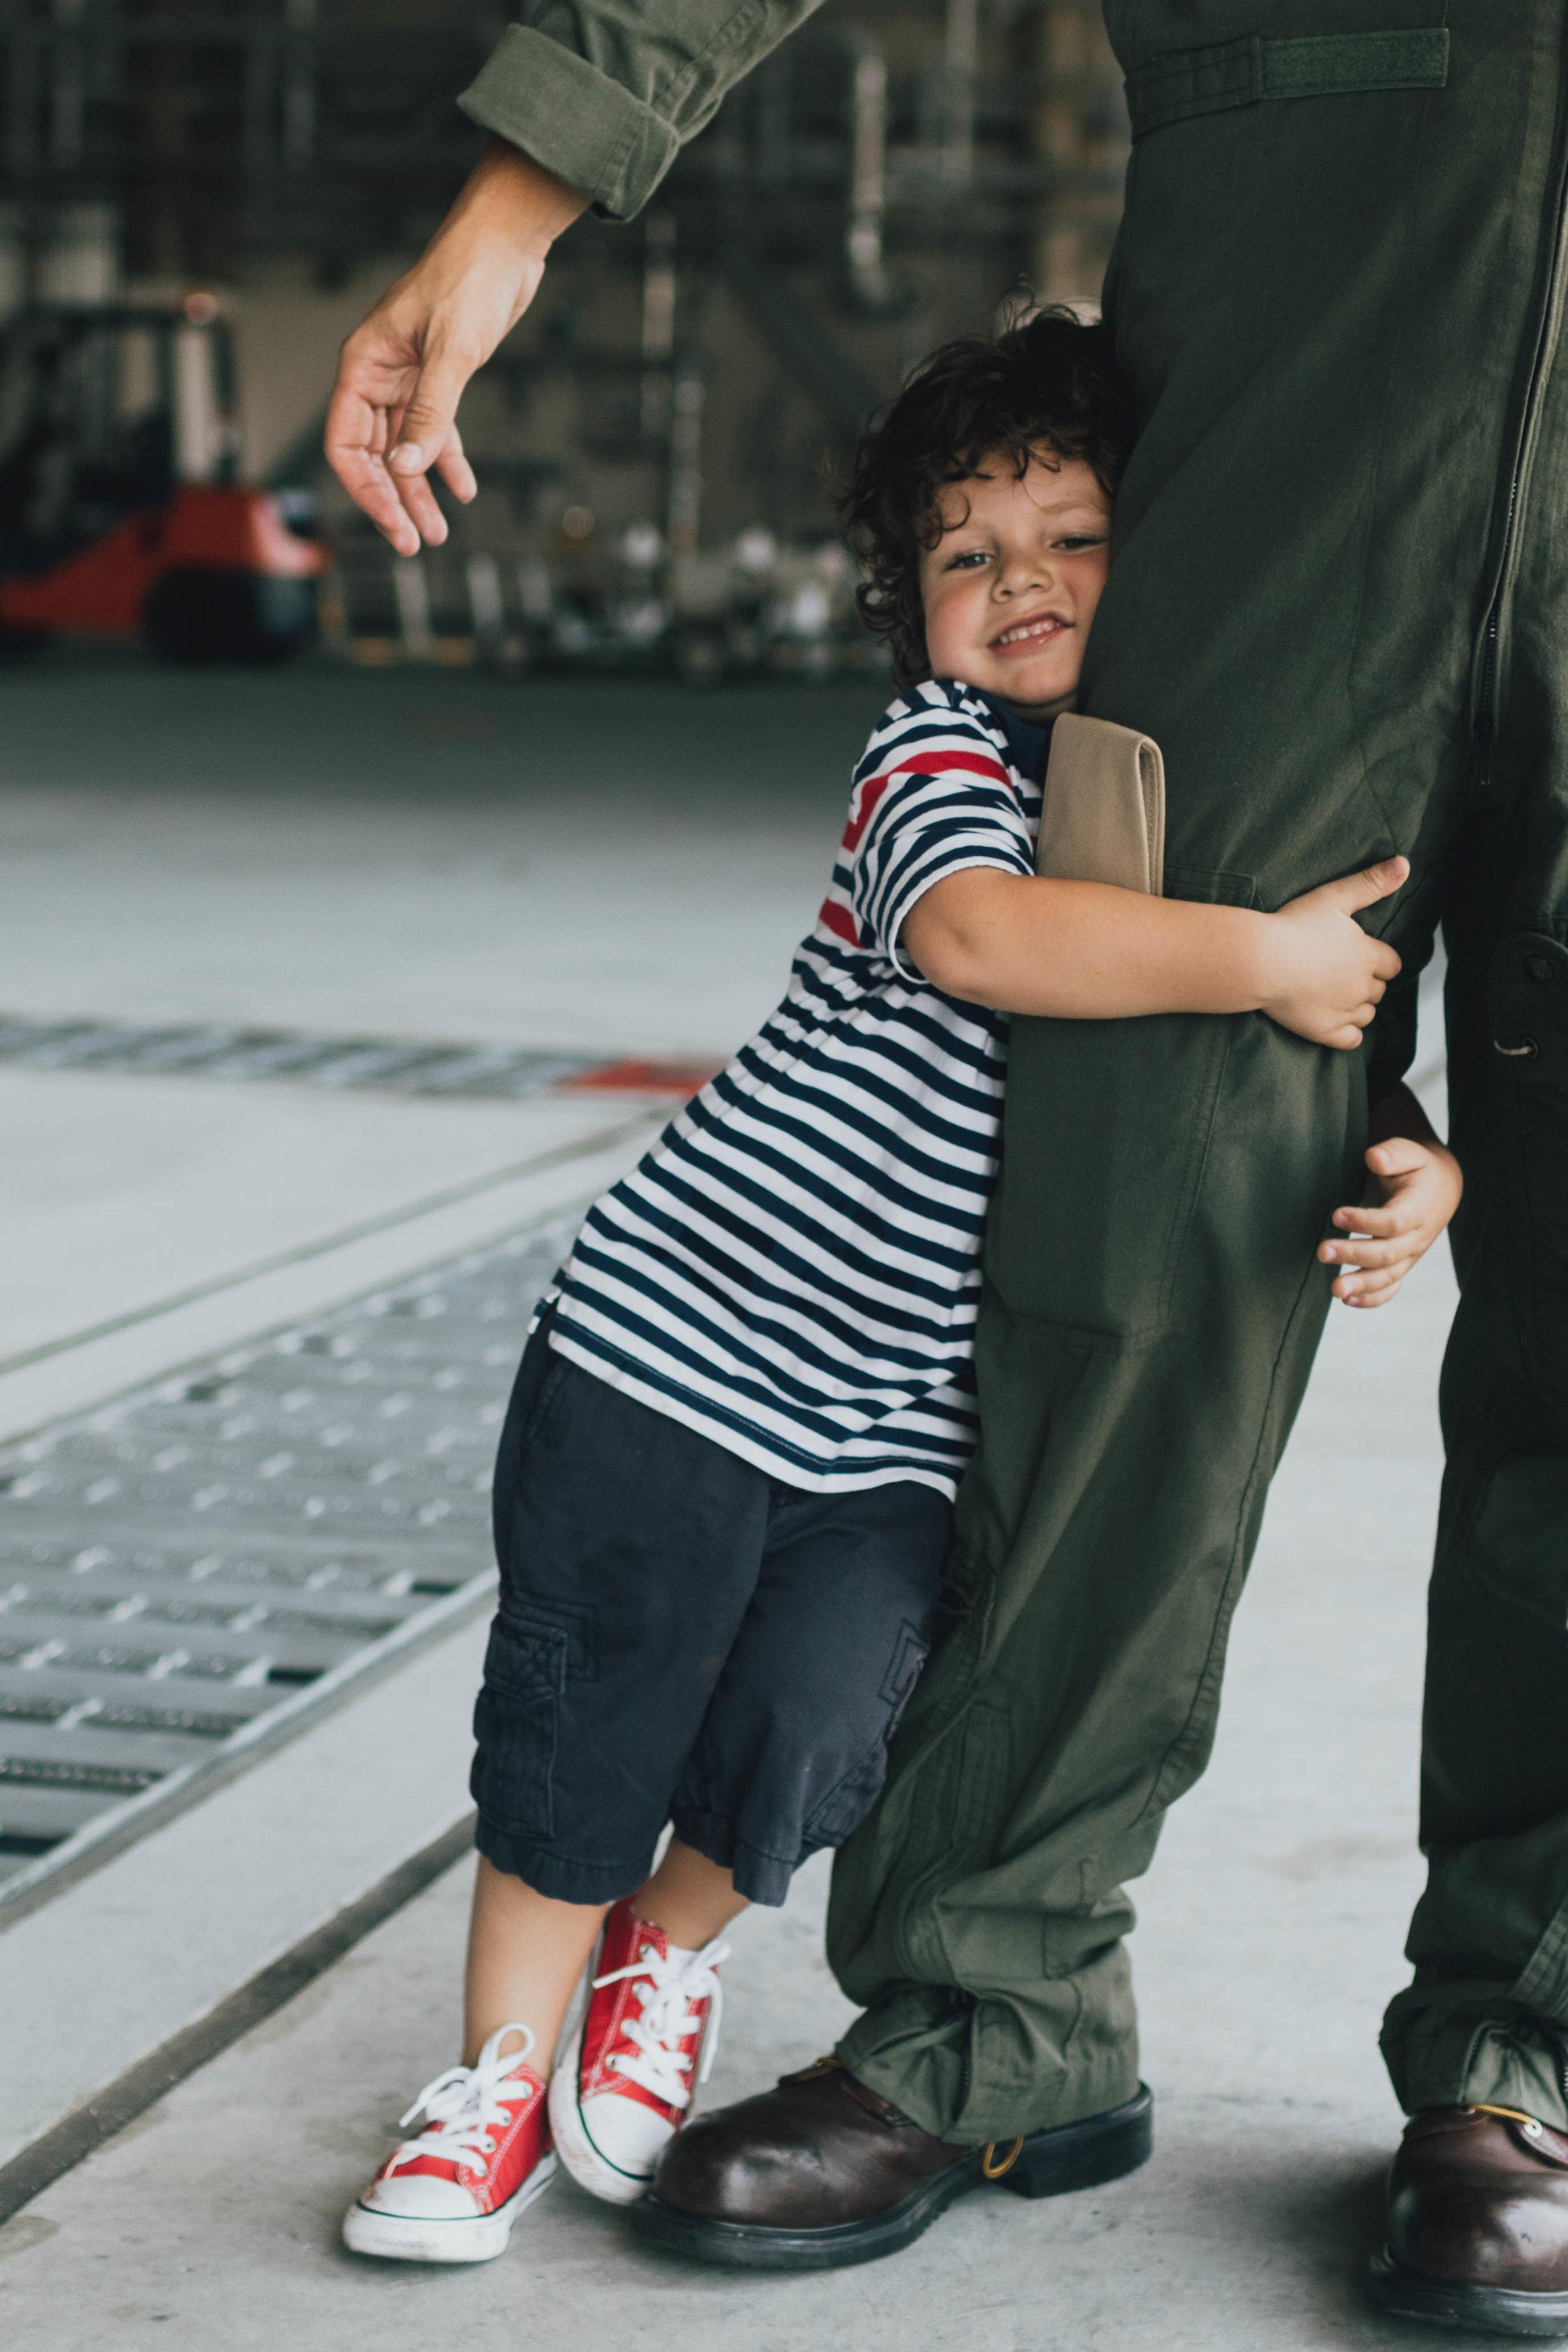 jet-pilot-homecoming-photos-by-samantha-look.jpg